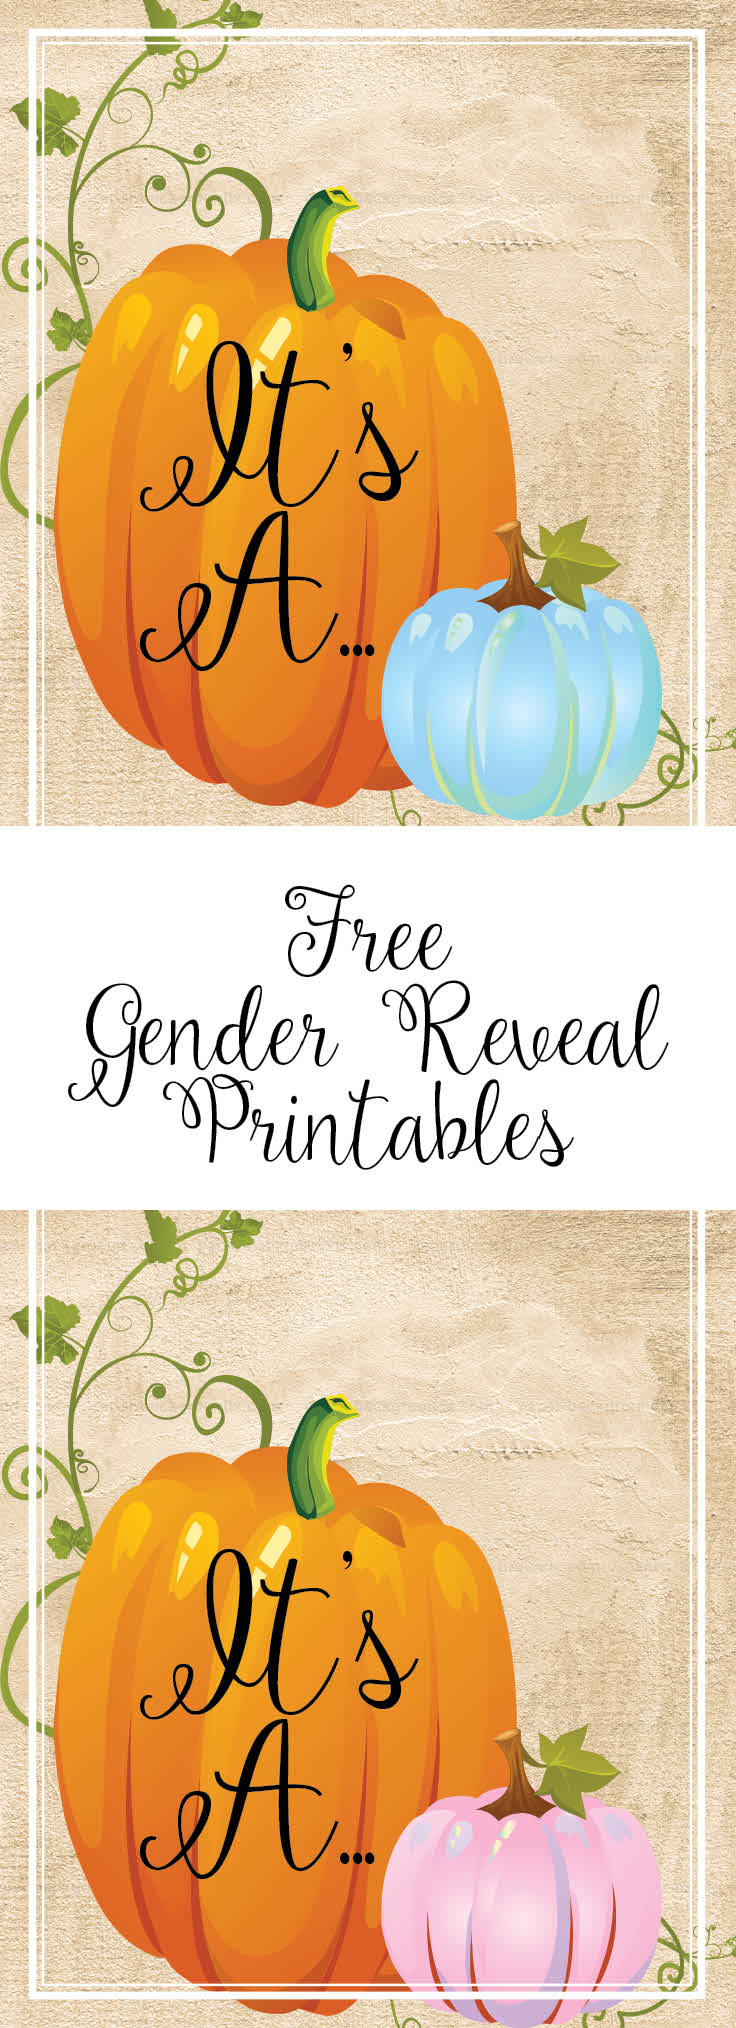 Free Fall Gender Reveal Printables